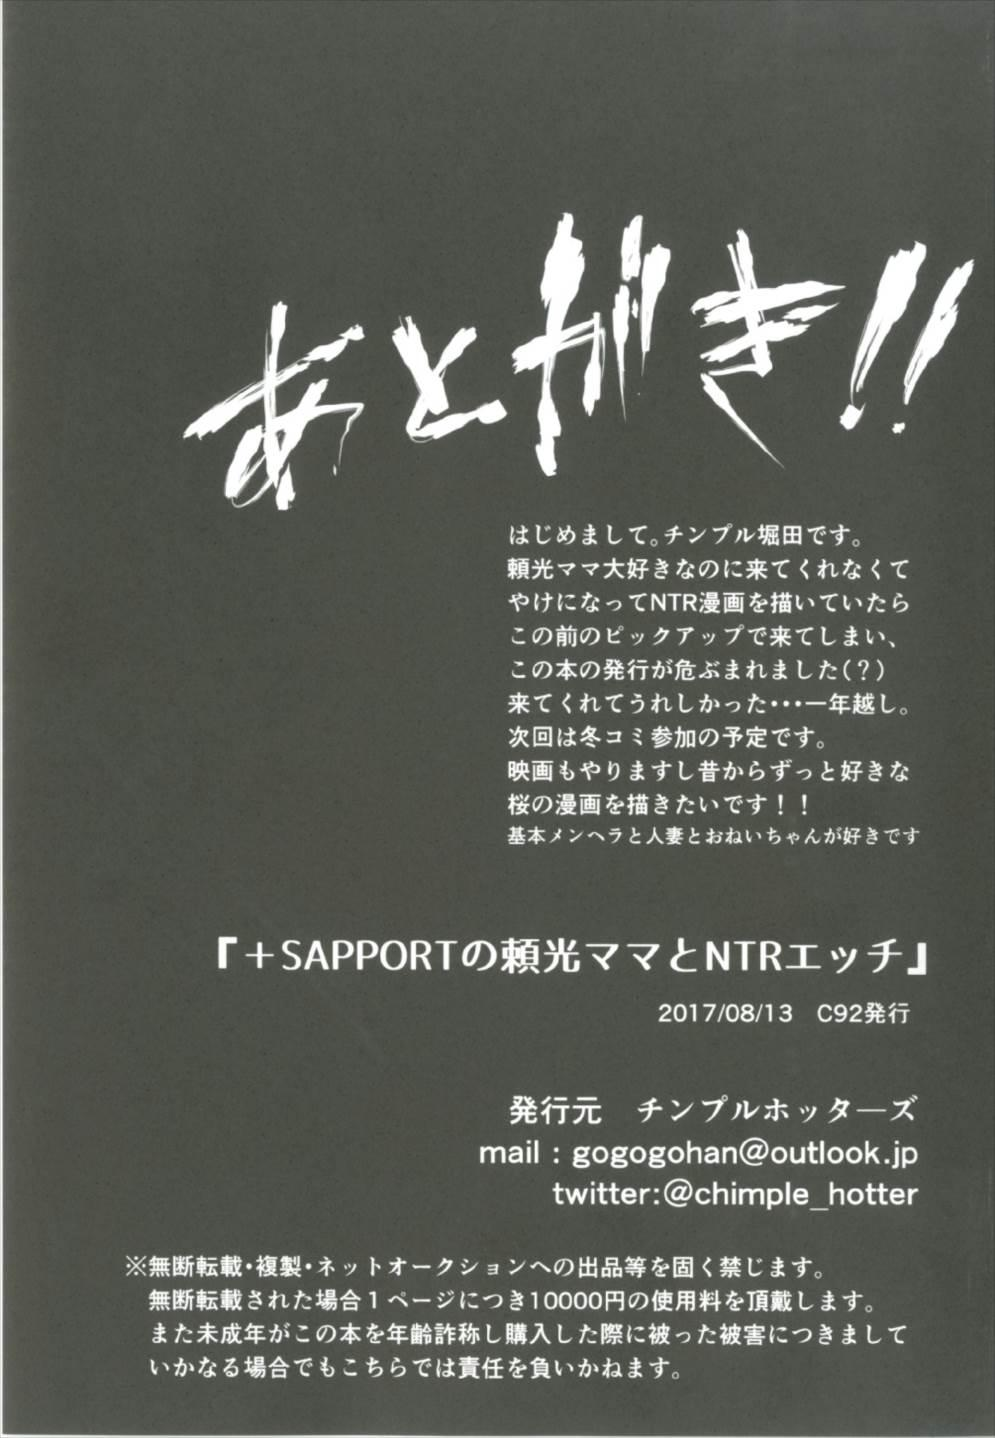 +SAPPORT no Raikou Mama to NTR Ecchi 24